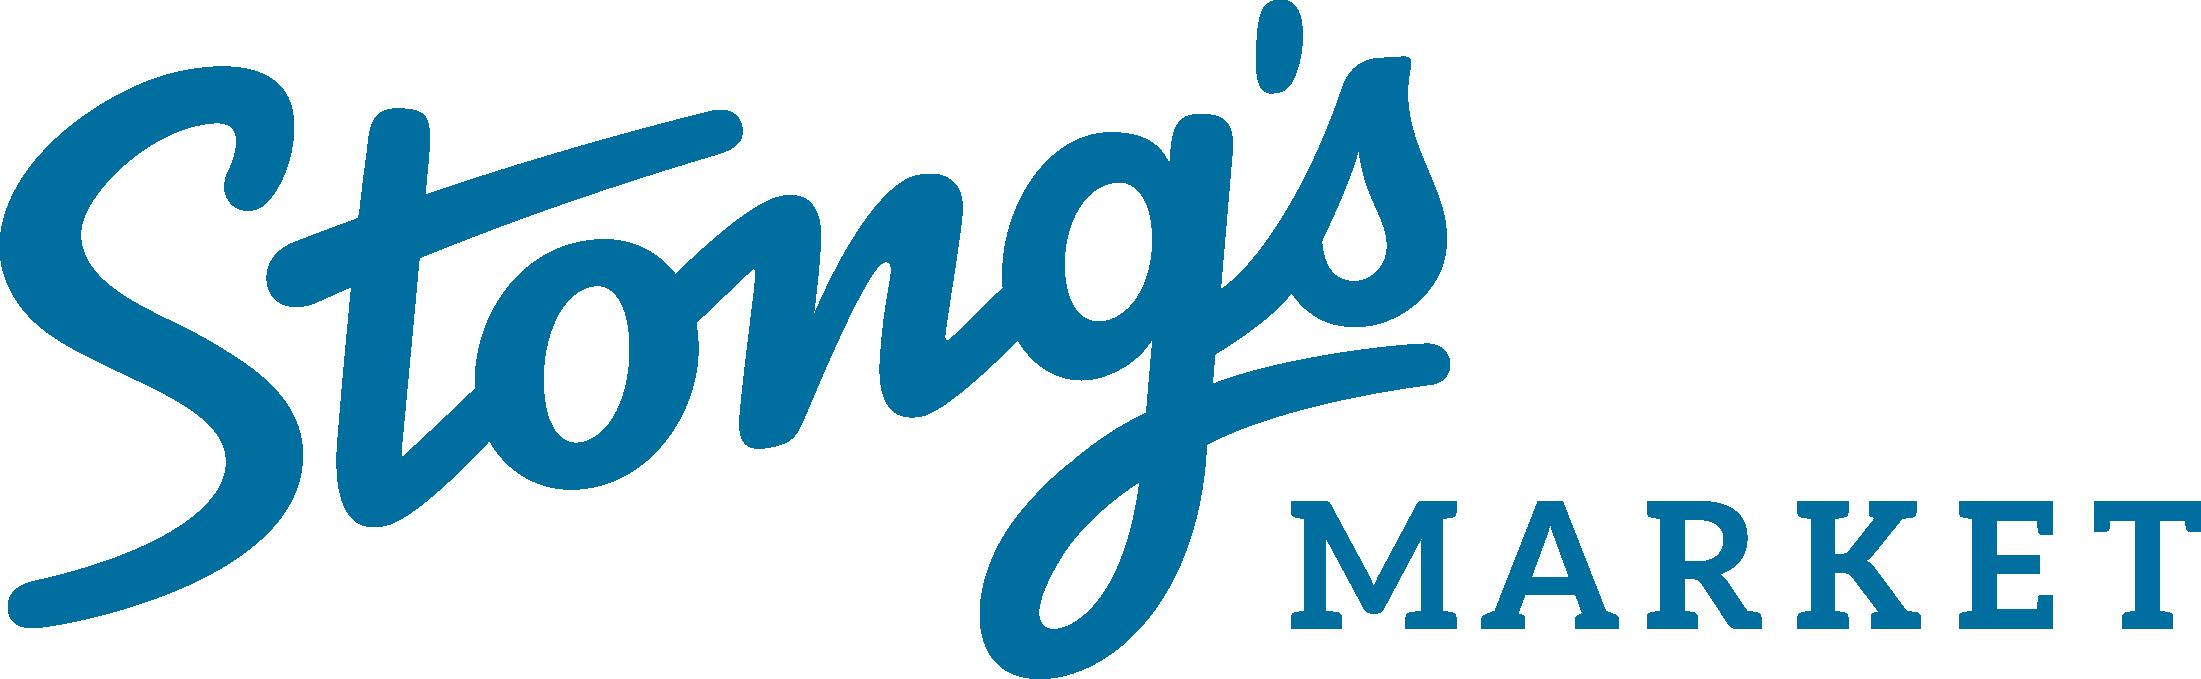 Stongs_logo